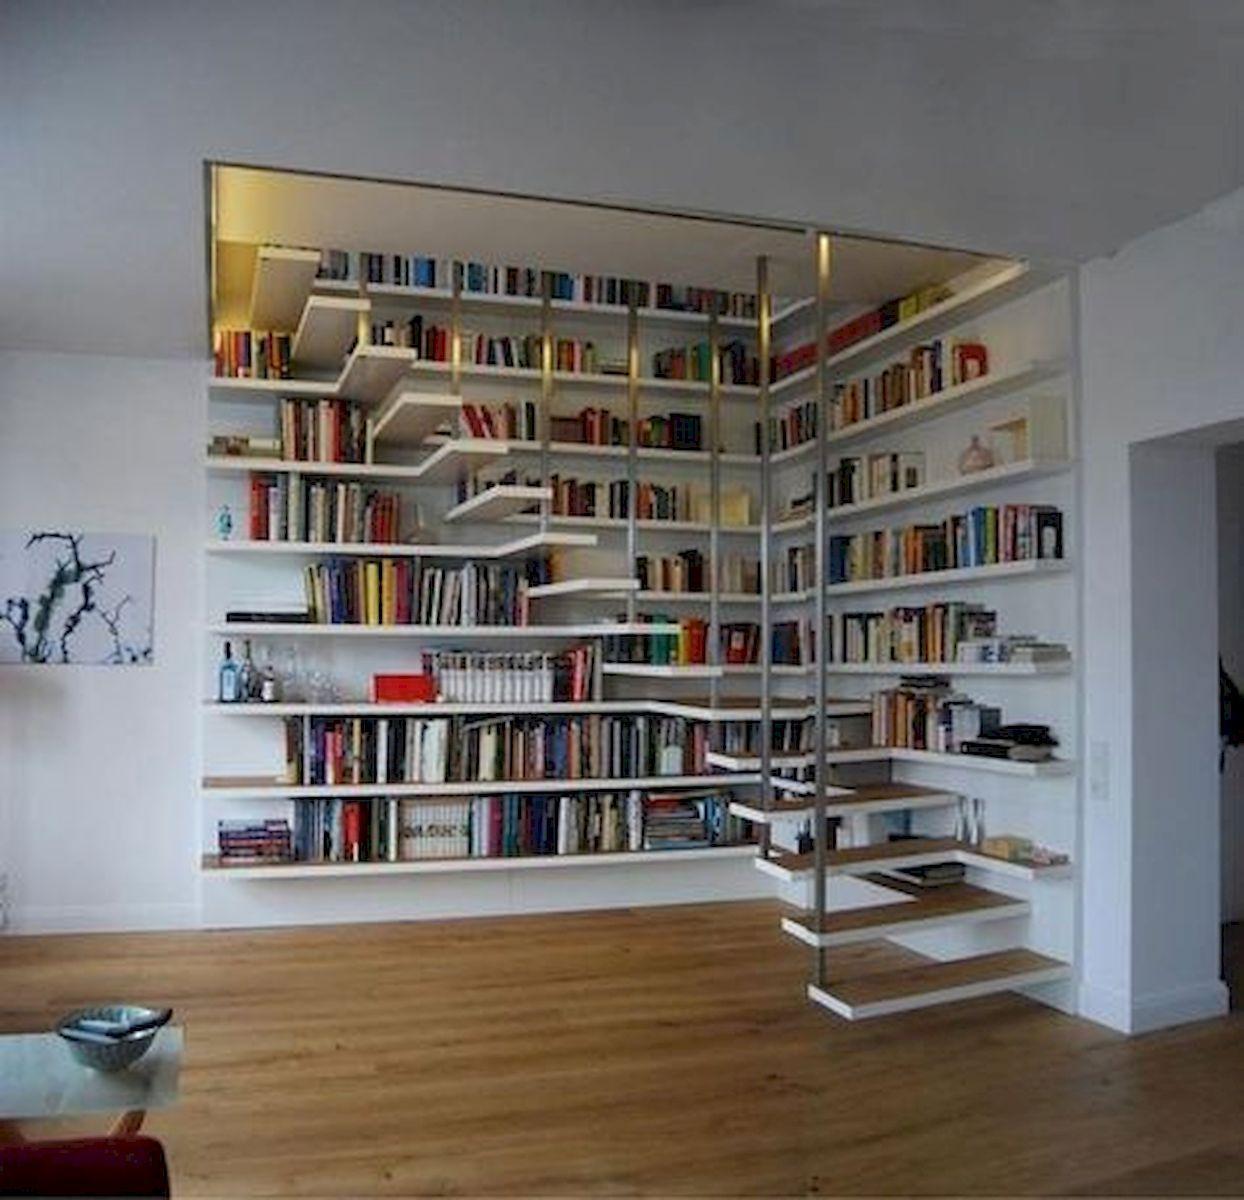 Creative Ways To Decor Bookshelves Around Stairs Interior Design Living Room House Home